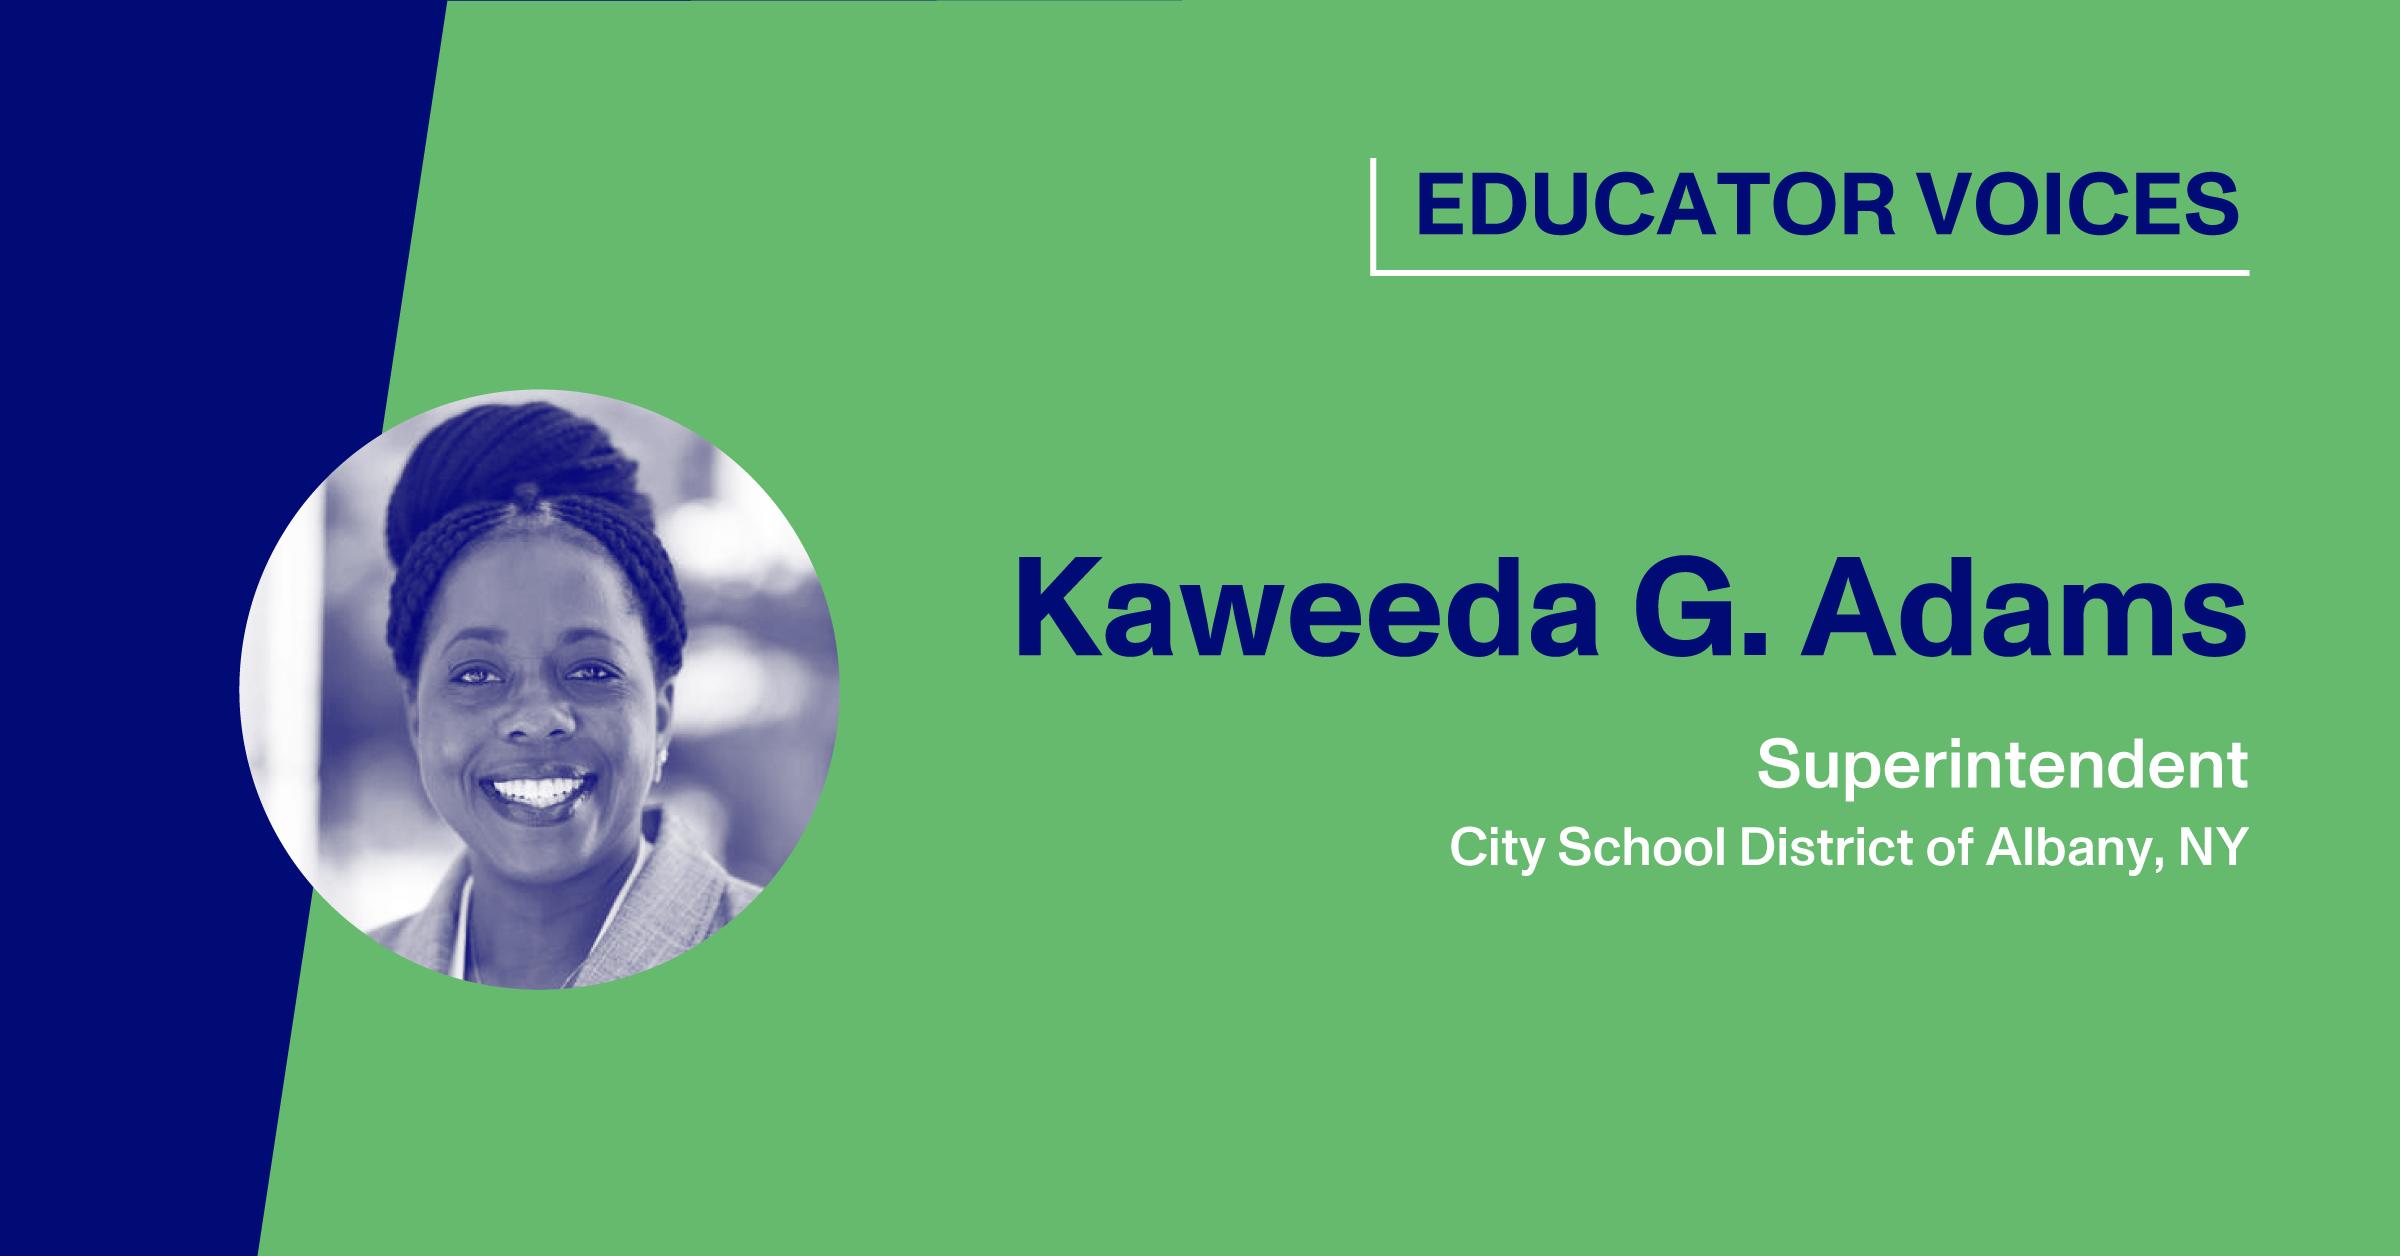 Blog Thumbnail with a headshot of Kaweeda G. Adams